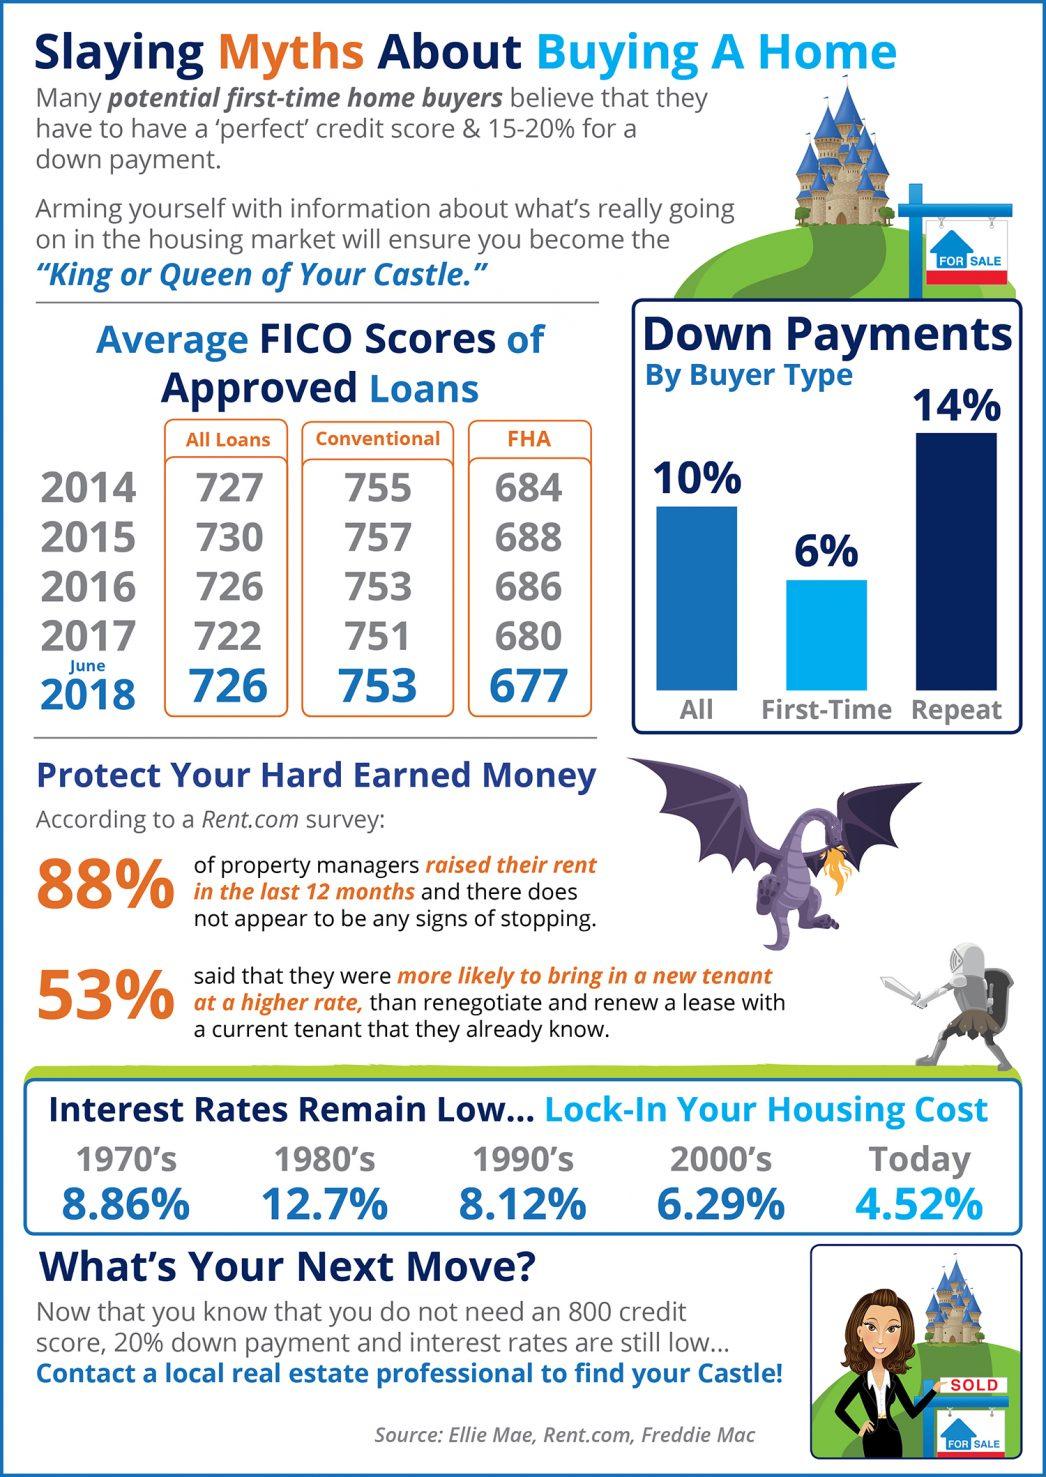 Home Buying Myths Slayed.jpg